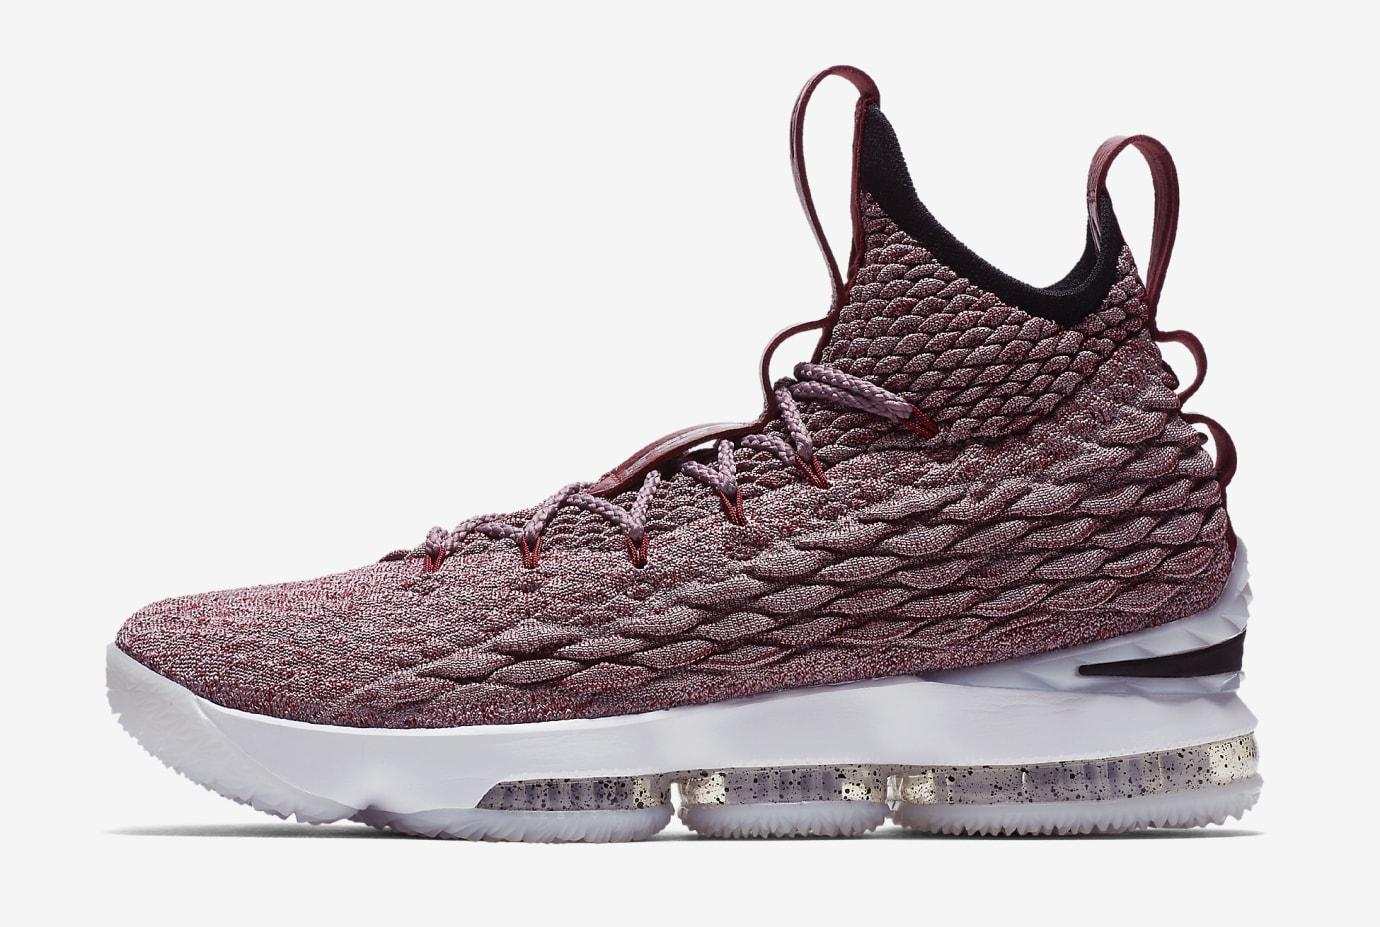 Nike LeBron 15 'Wine' 897649-201 (Lateral)